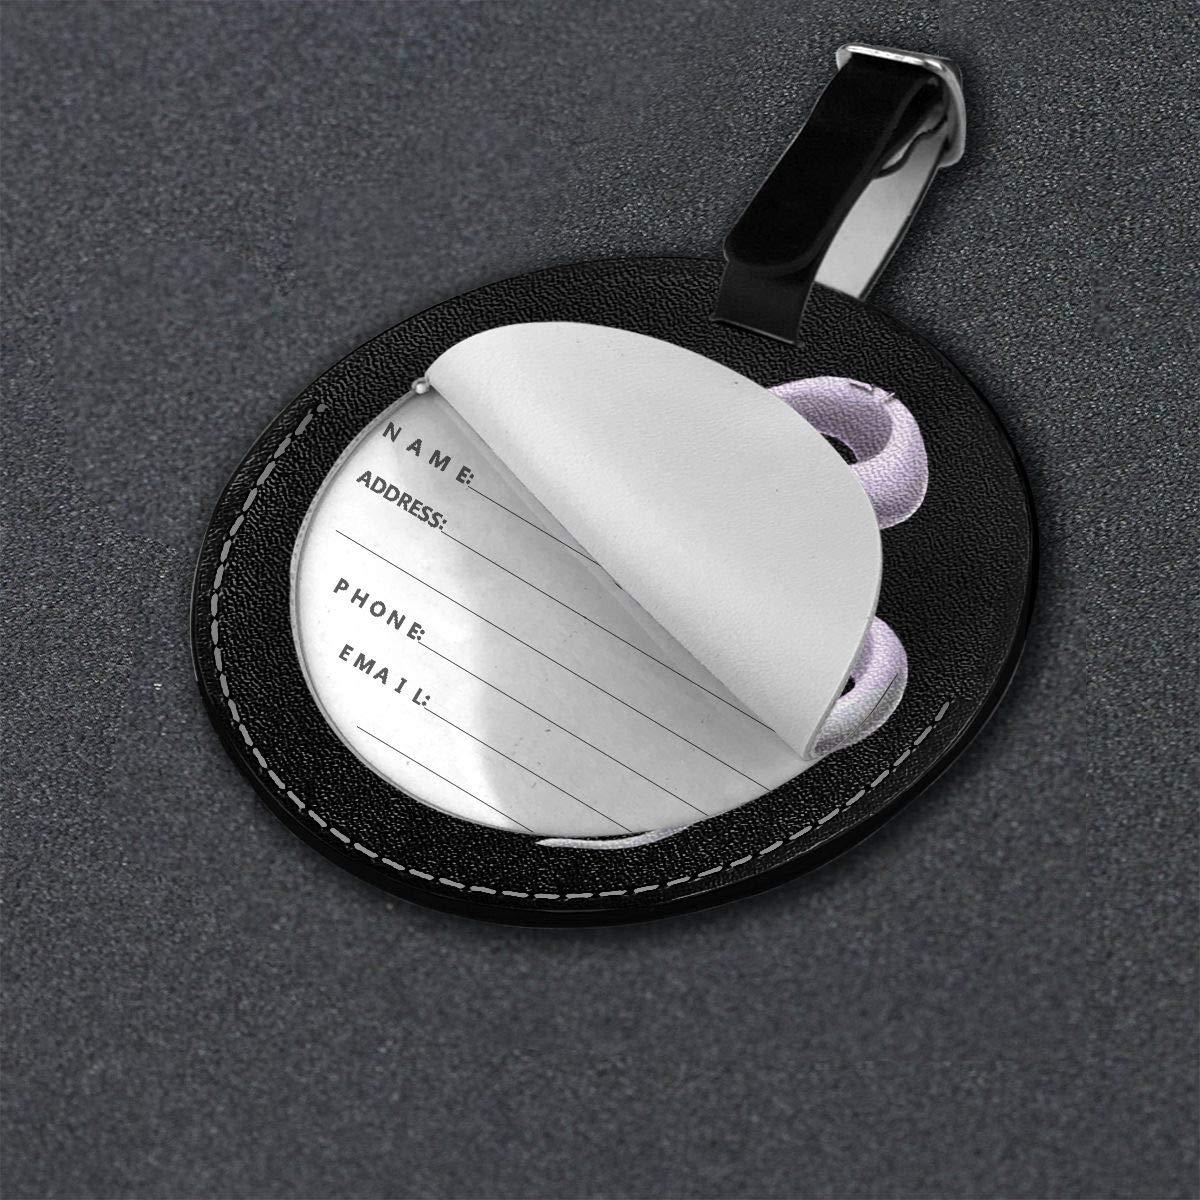 Whitesnake Travel Leather Round Luggage Tags Suitcase Labels Bag